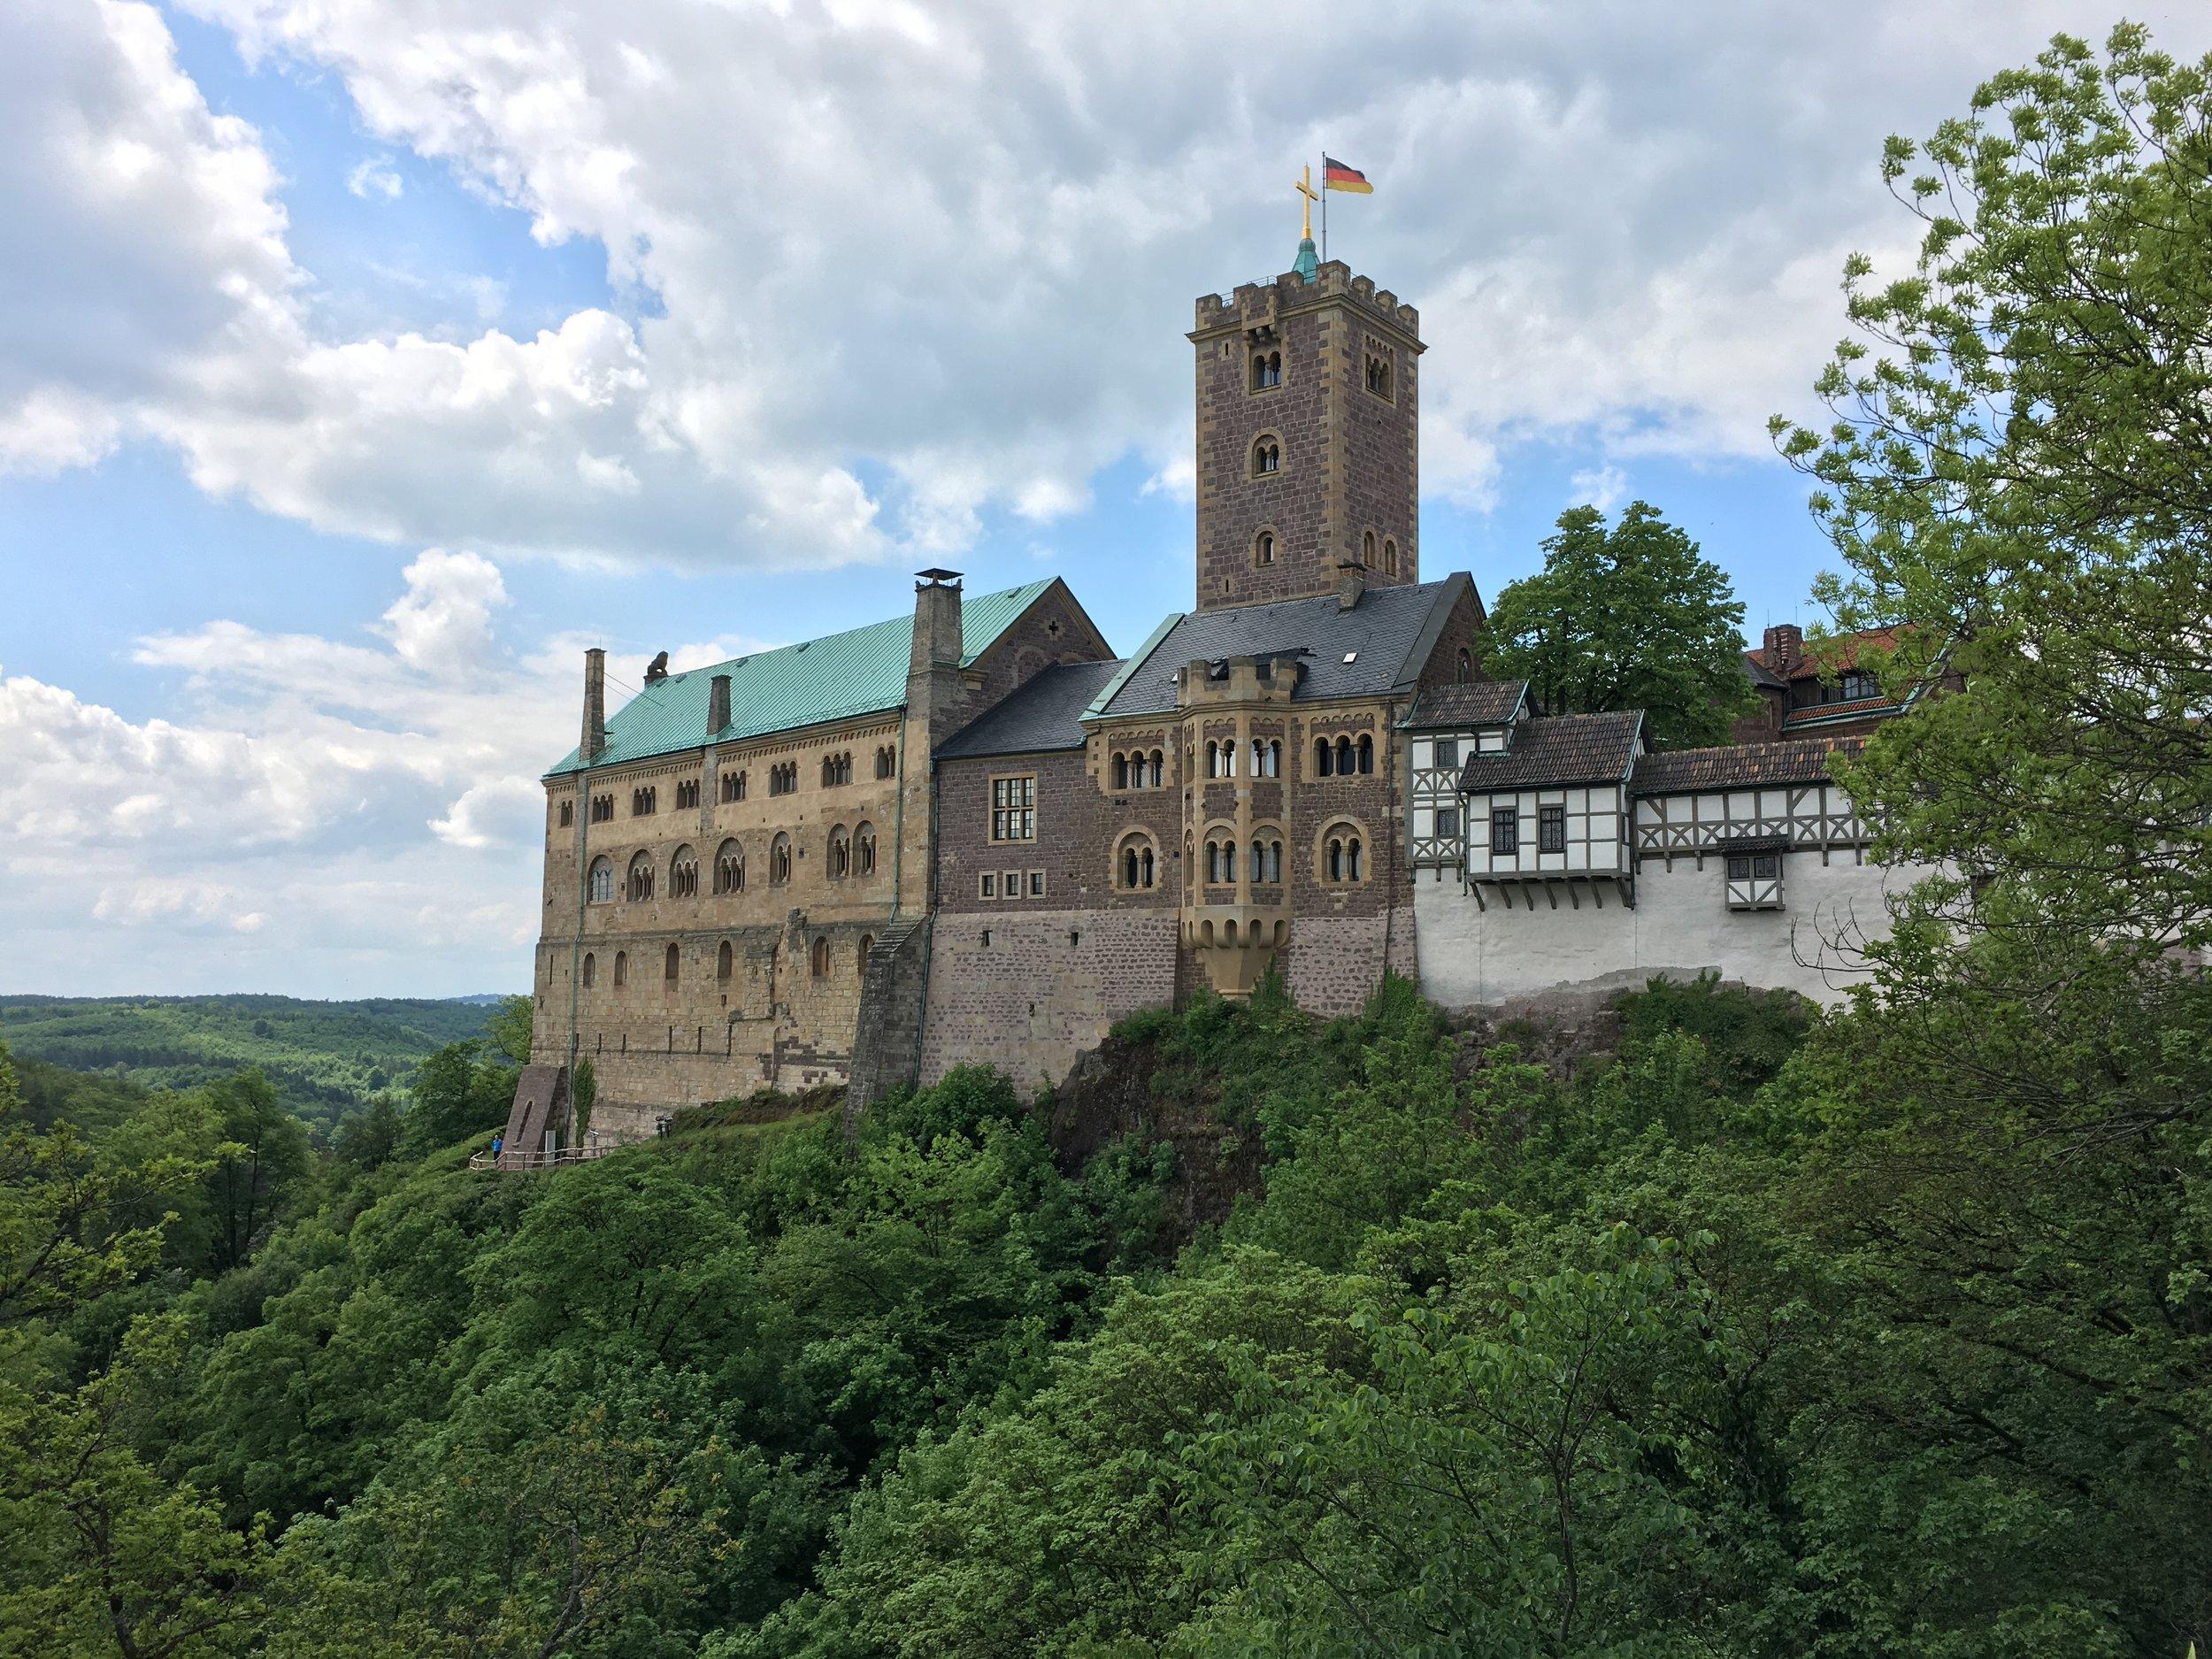 Wartburg Castle (PHOTO: Ken Chitwood)